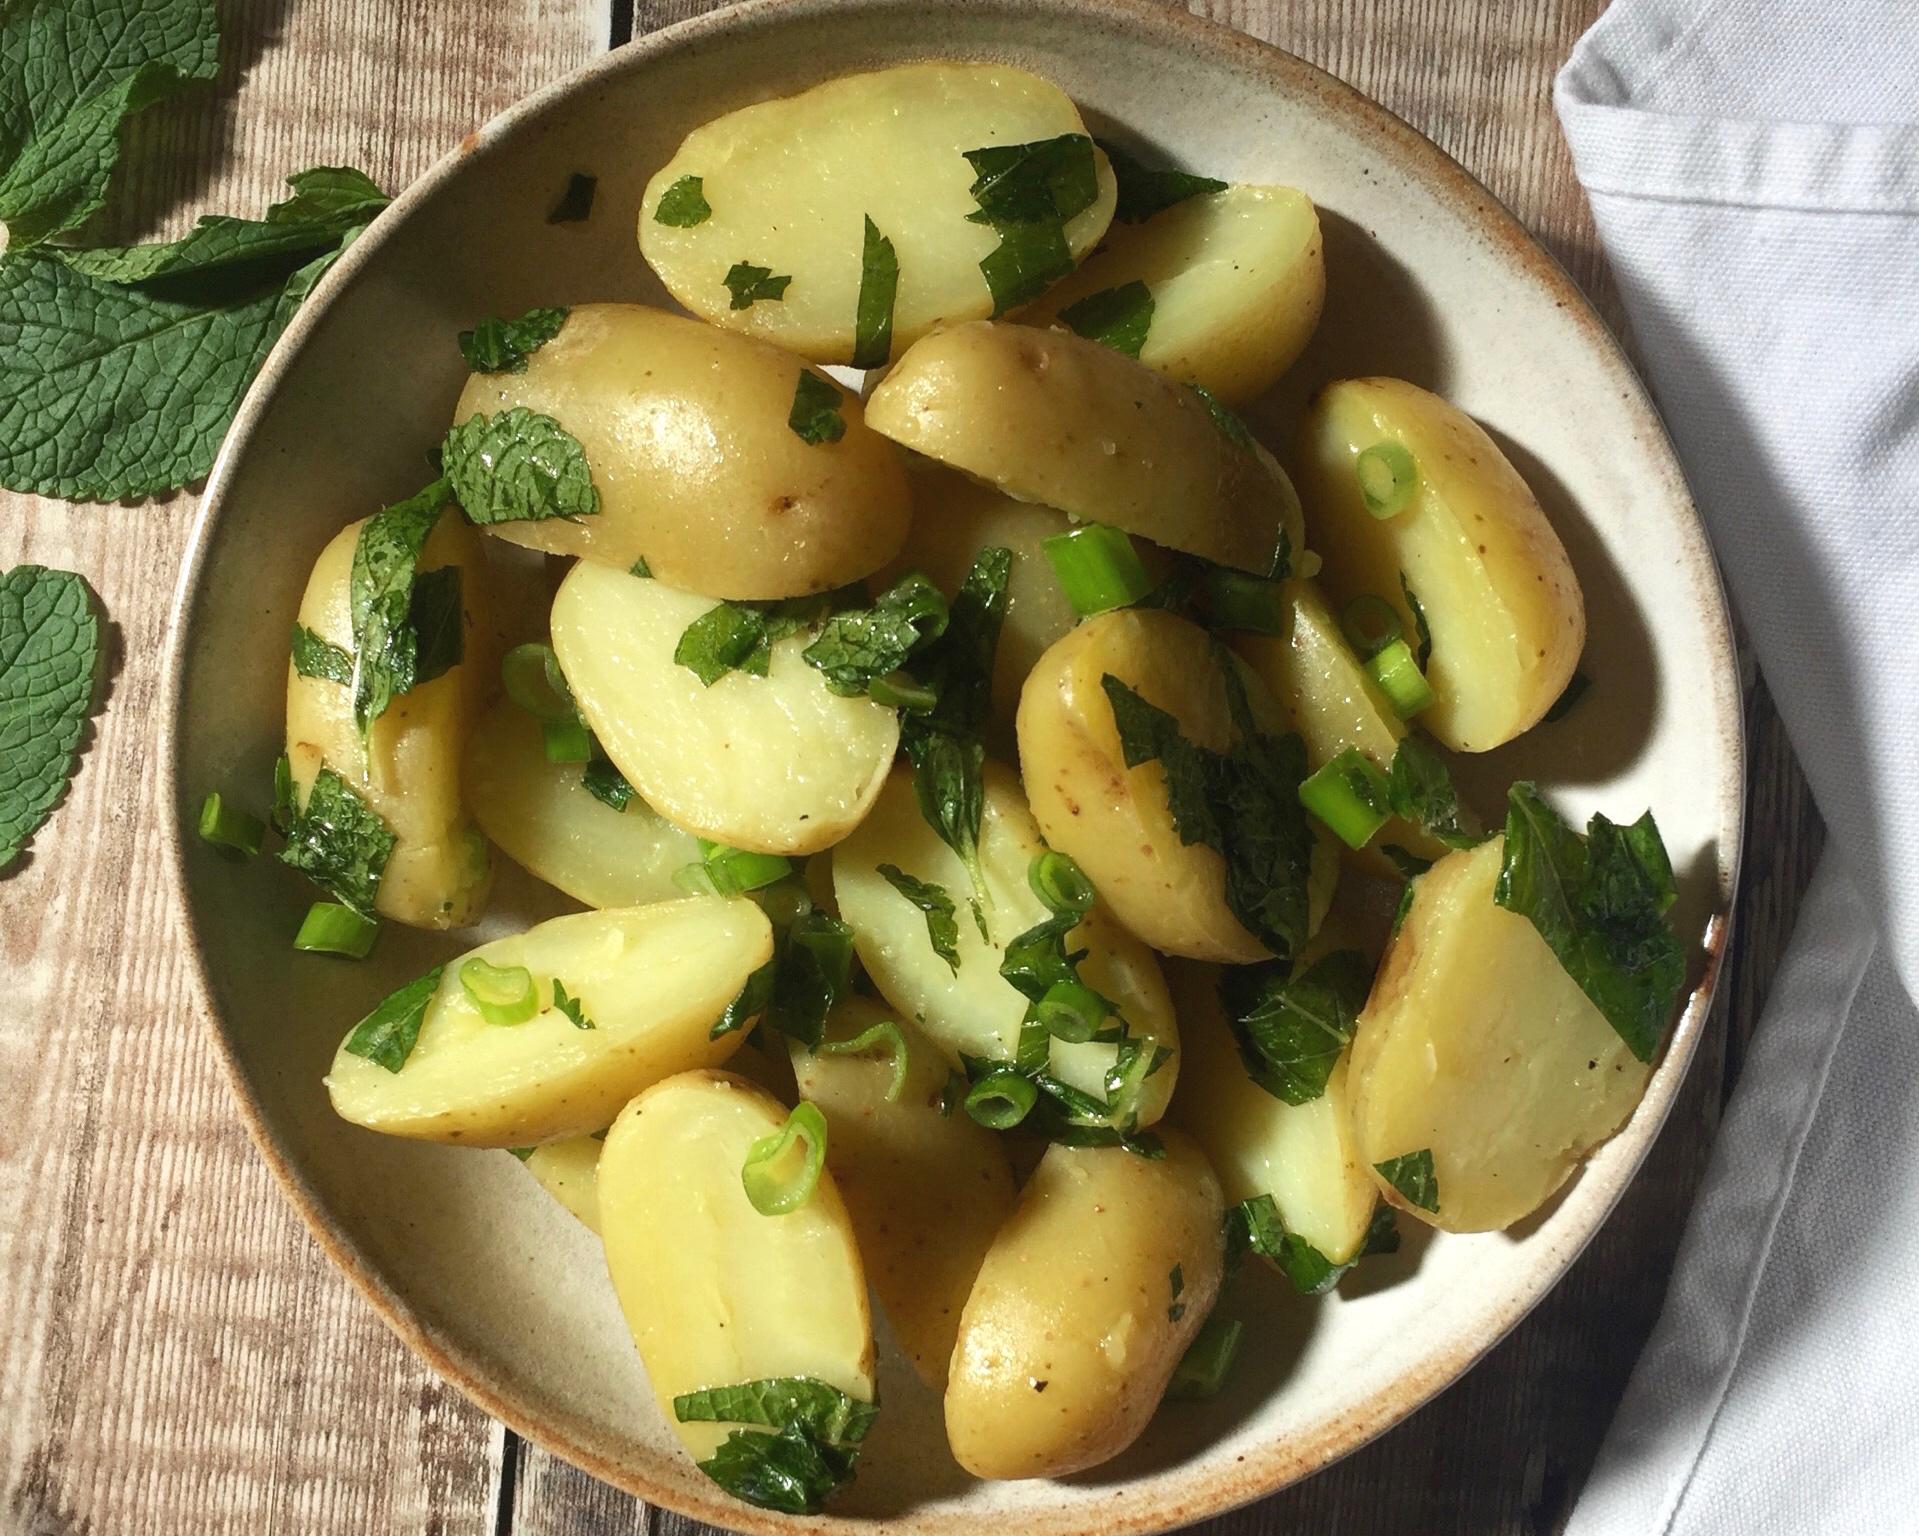 Potato+Salad+with+Mint+%26+Lemon+Dressing+Nourish+by+Rebecca.jpg